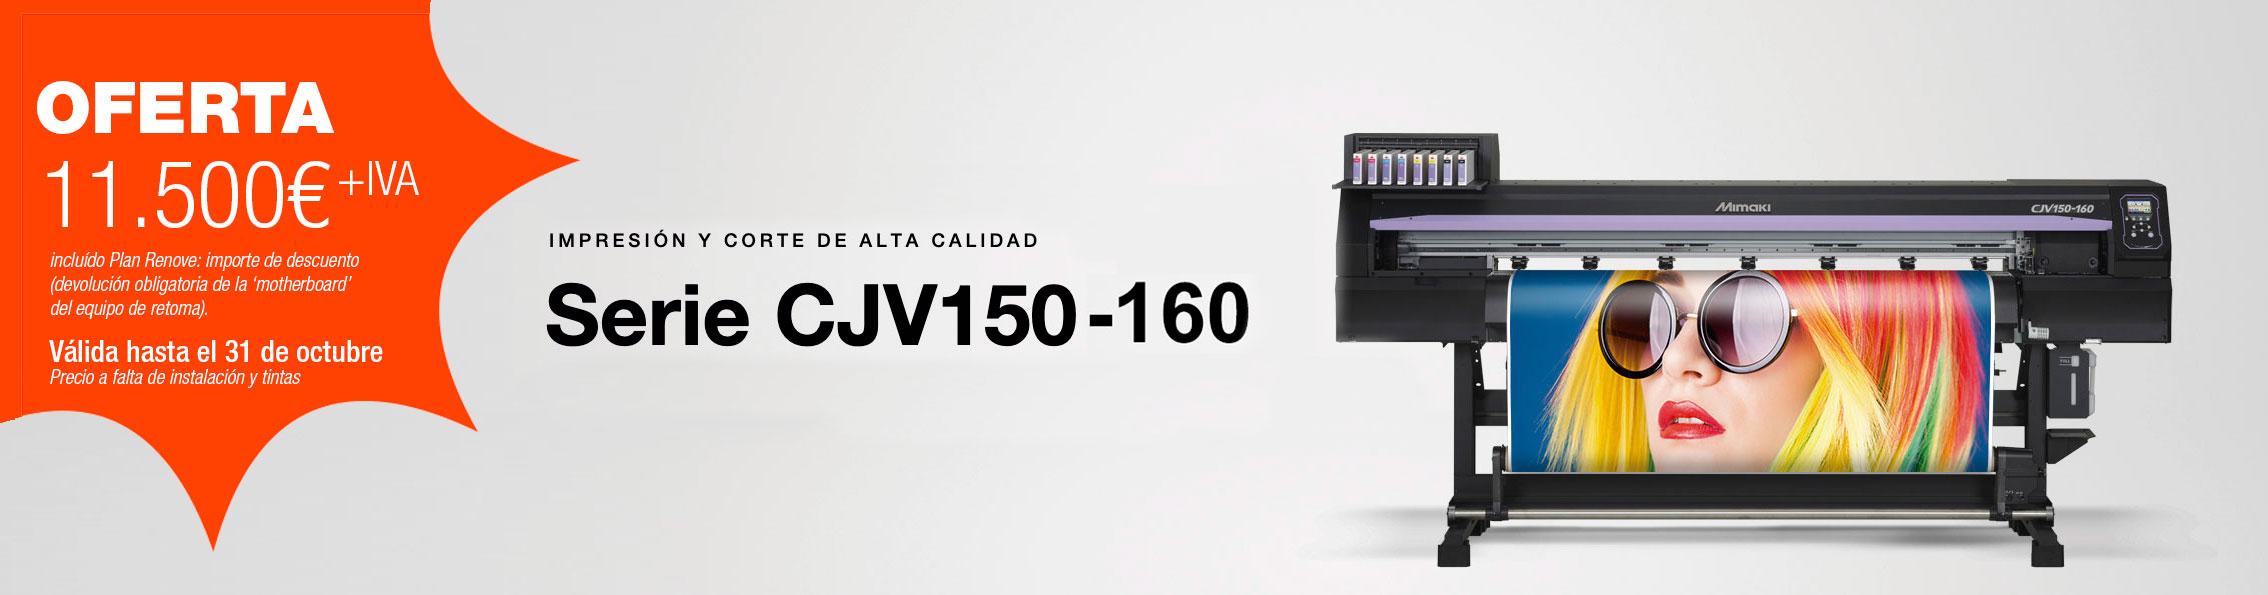 OFERTAS-CJV150-160